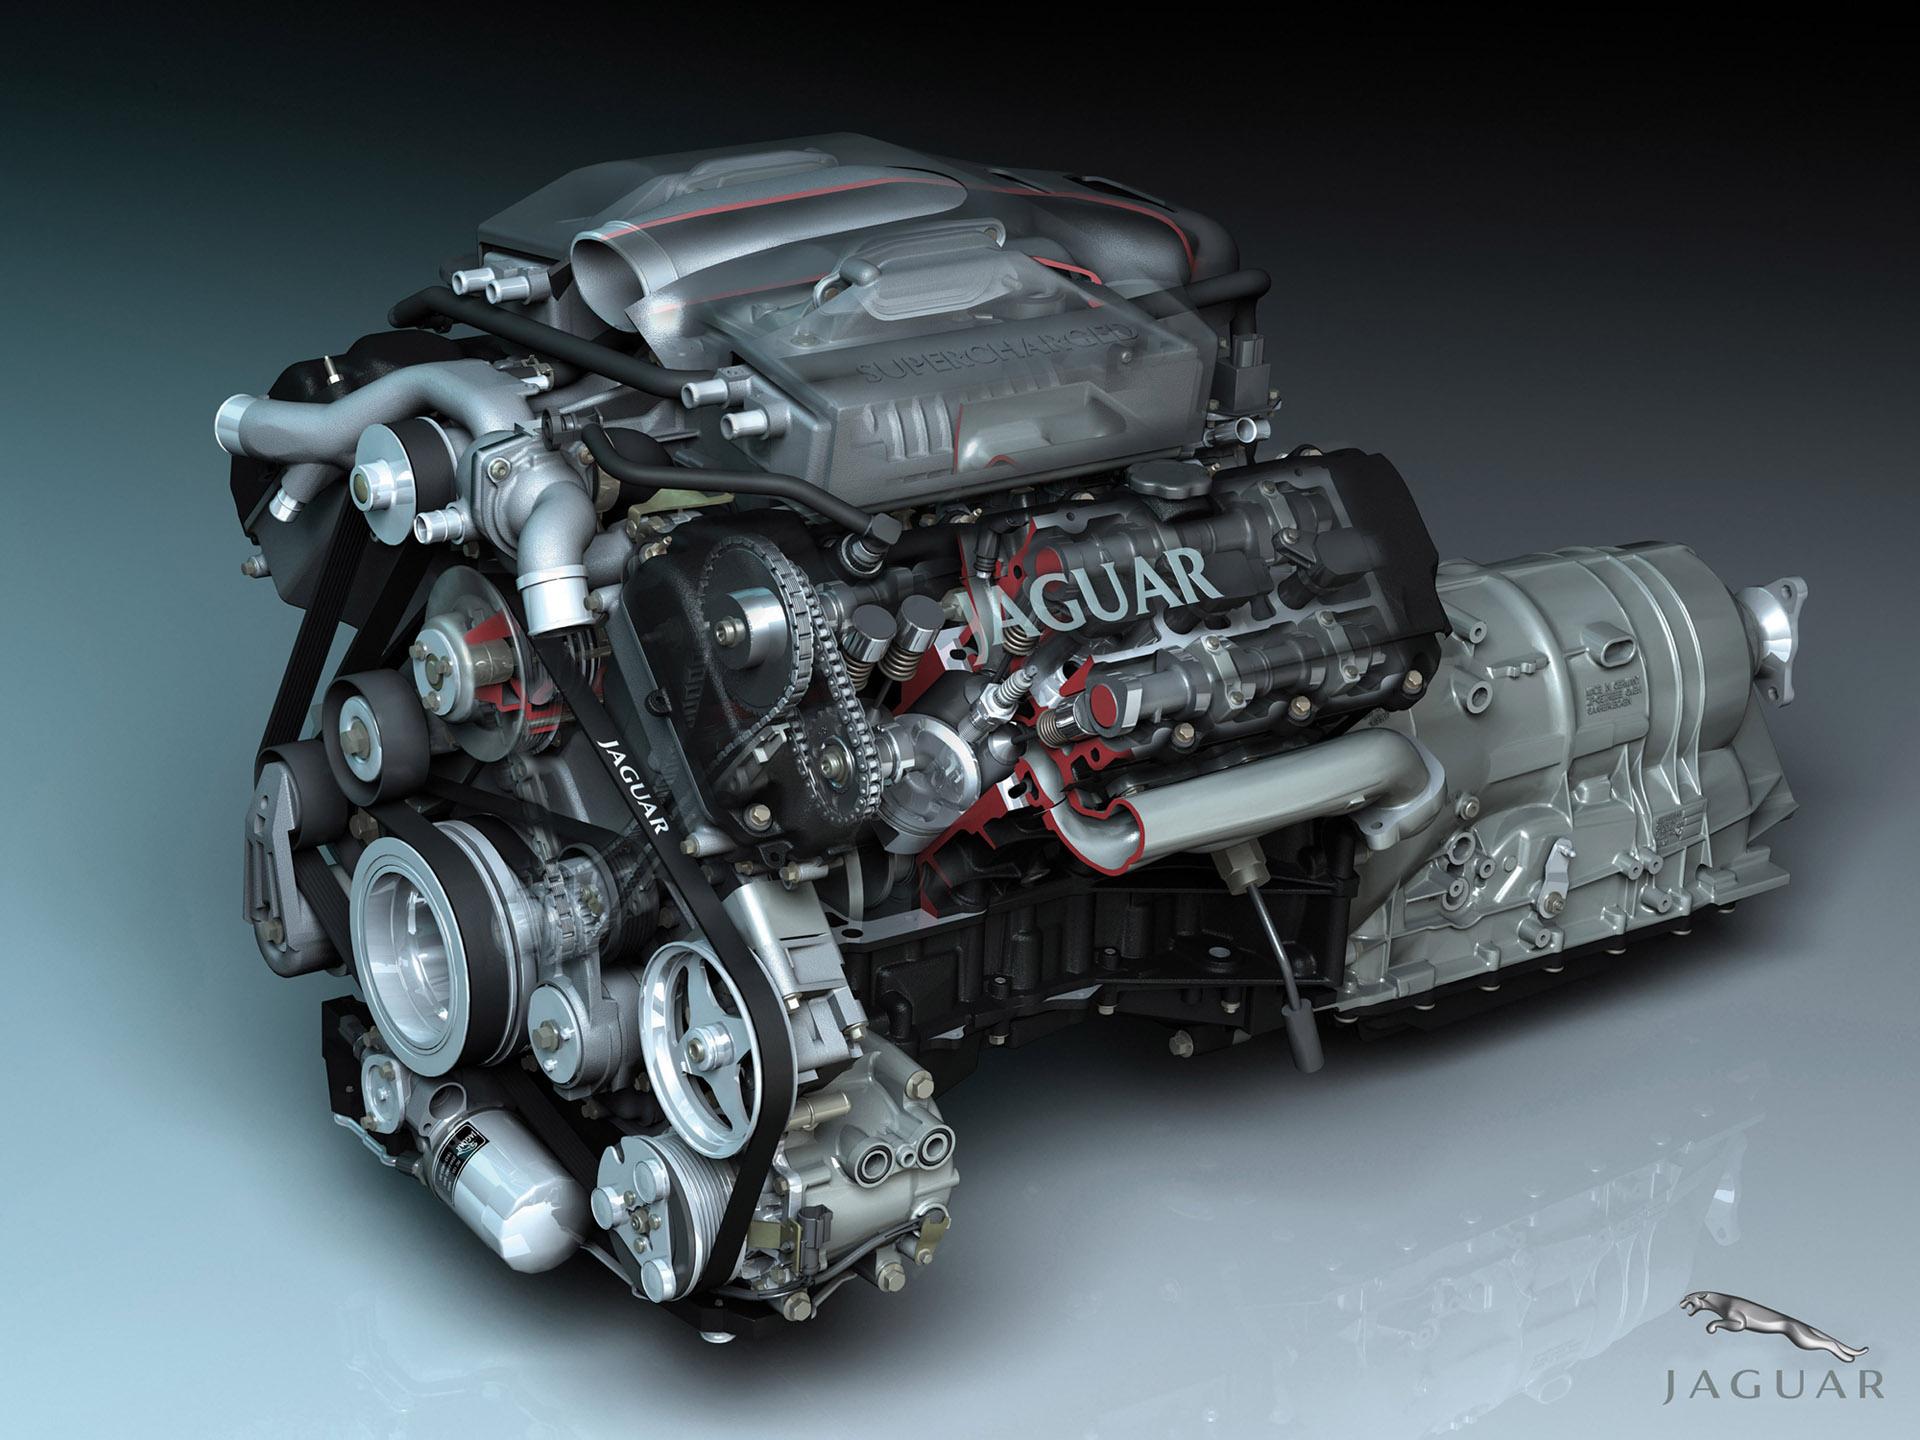 hintergrundbilder fahrzeug technologie motoren jaguar. Black Bedroom Furniture Sets. Home Design Ideas